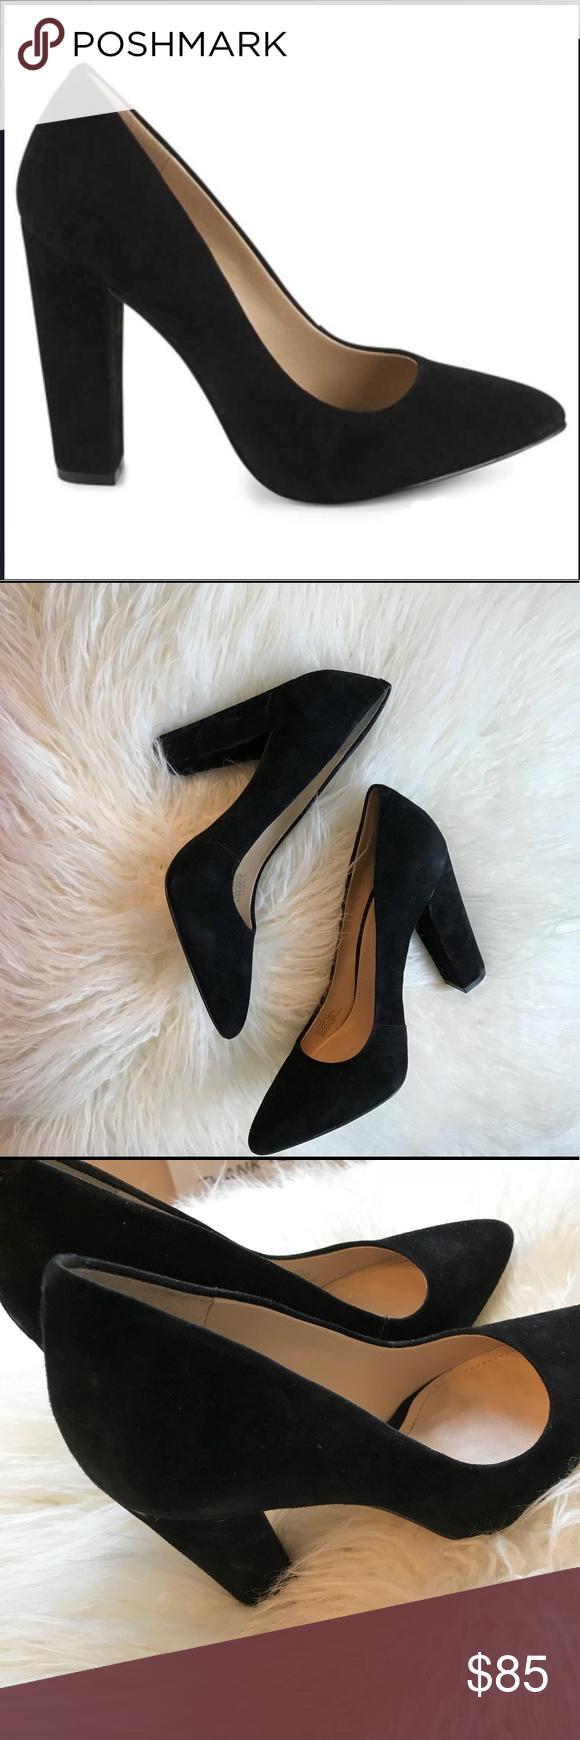 "7d5d019f251 🔥 CYBER MONDAY🔥Super Secy BCBG heels BCBG sexy heels. ""Clarice ..."